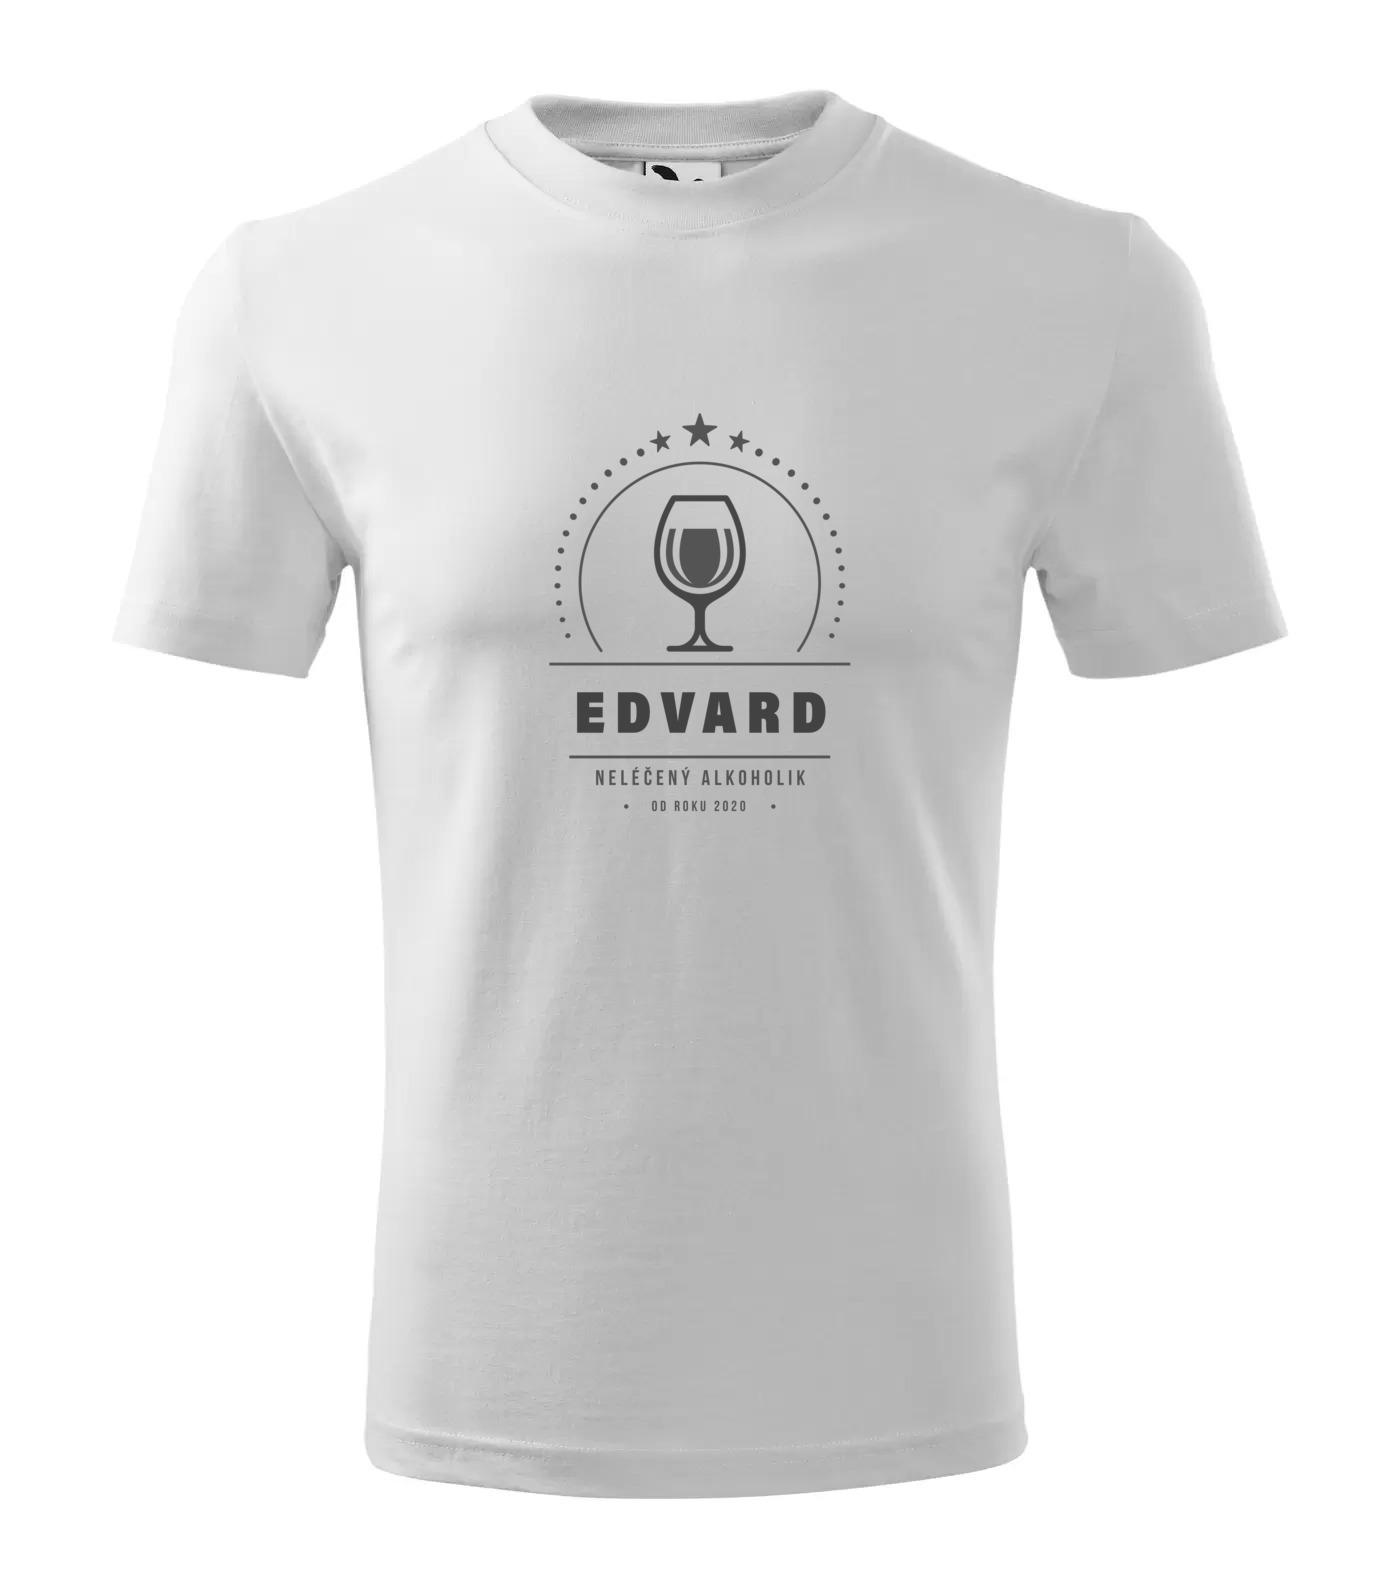 Tričko Alkoholik Edvard